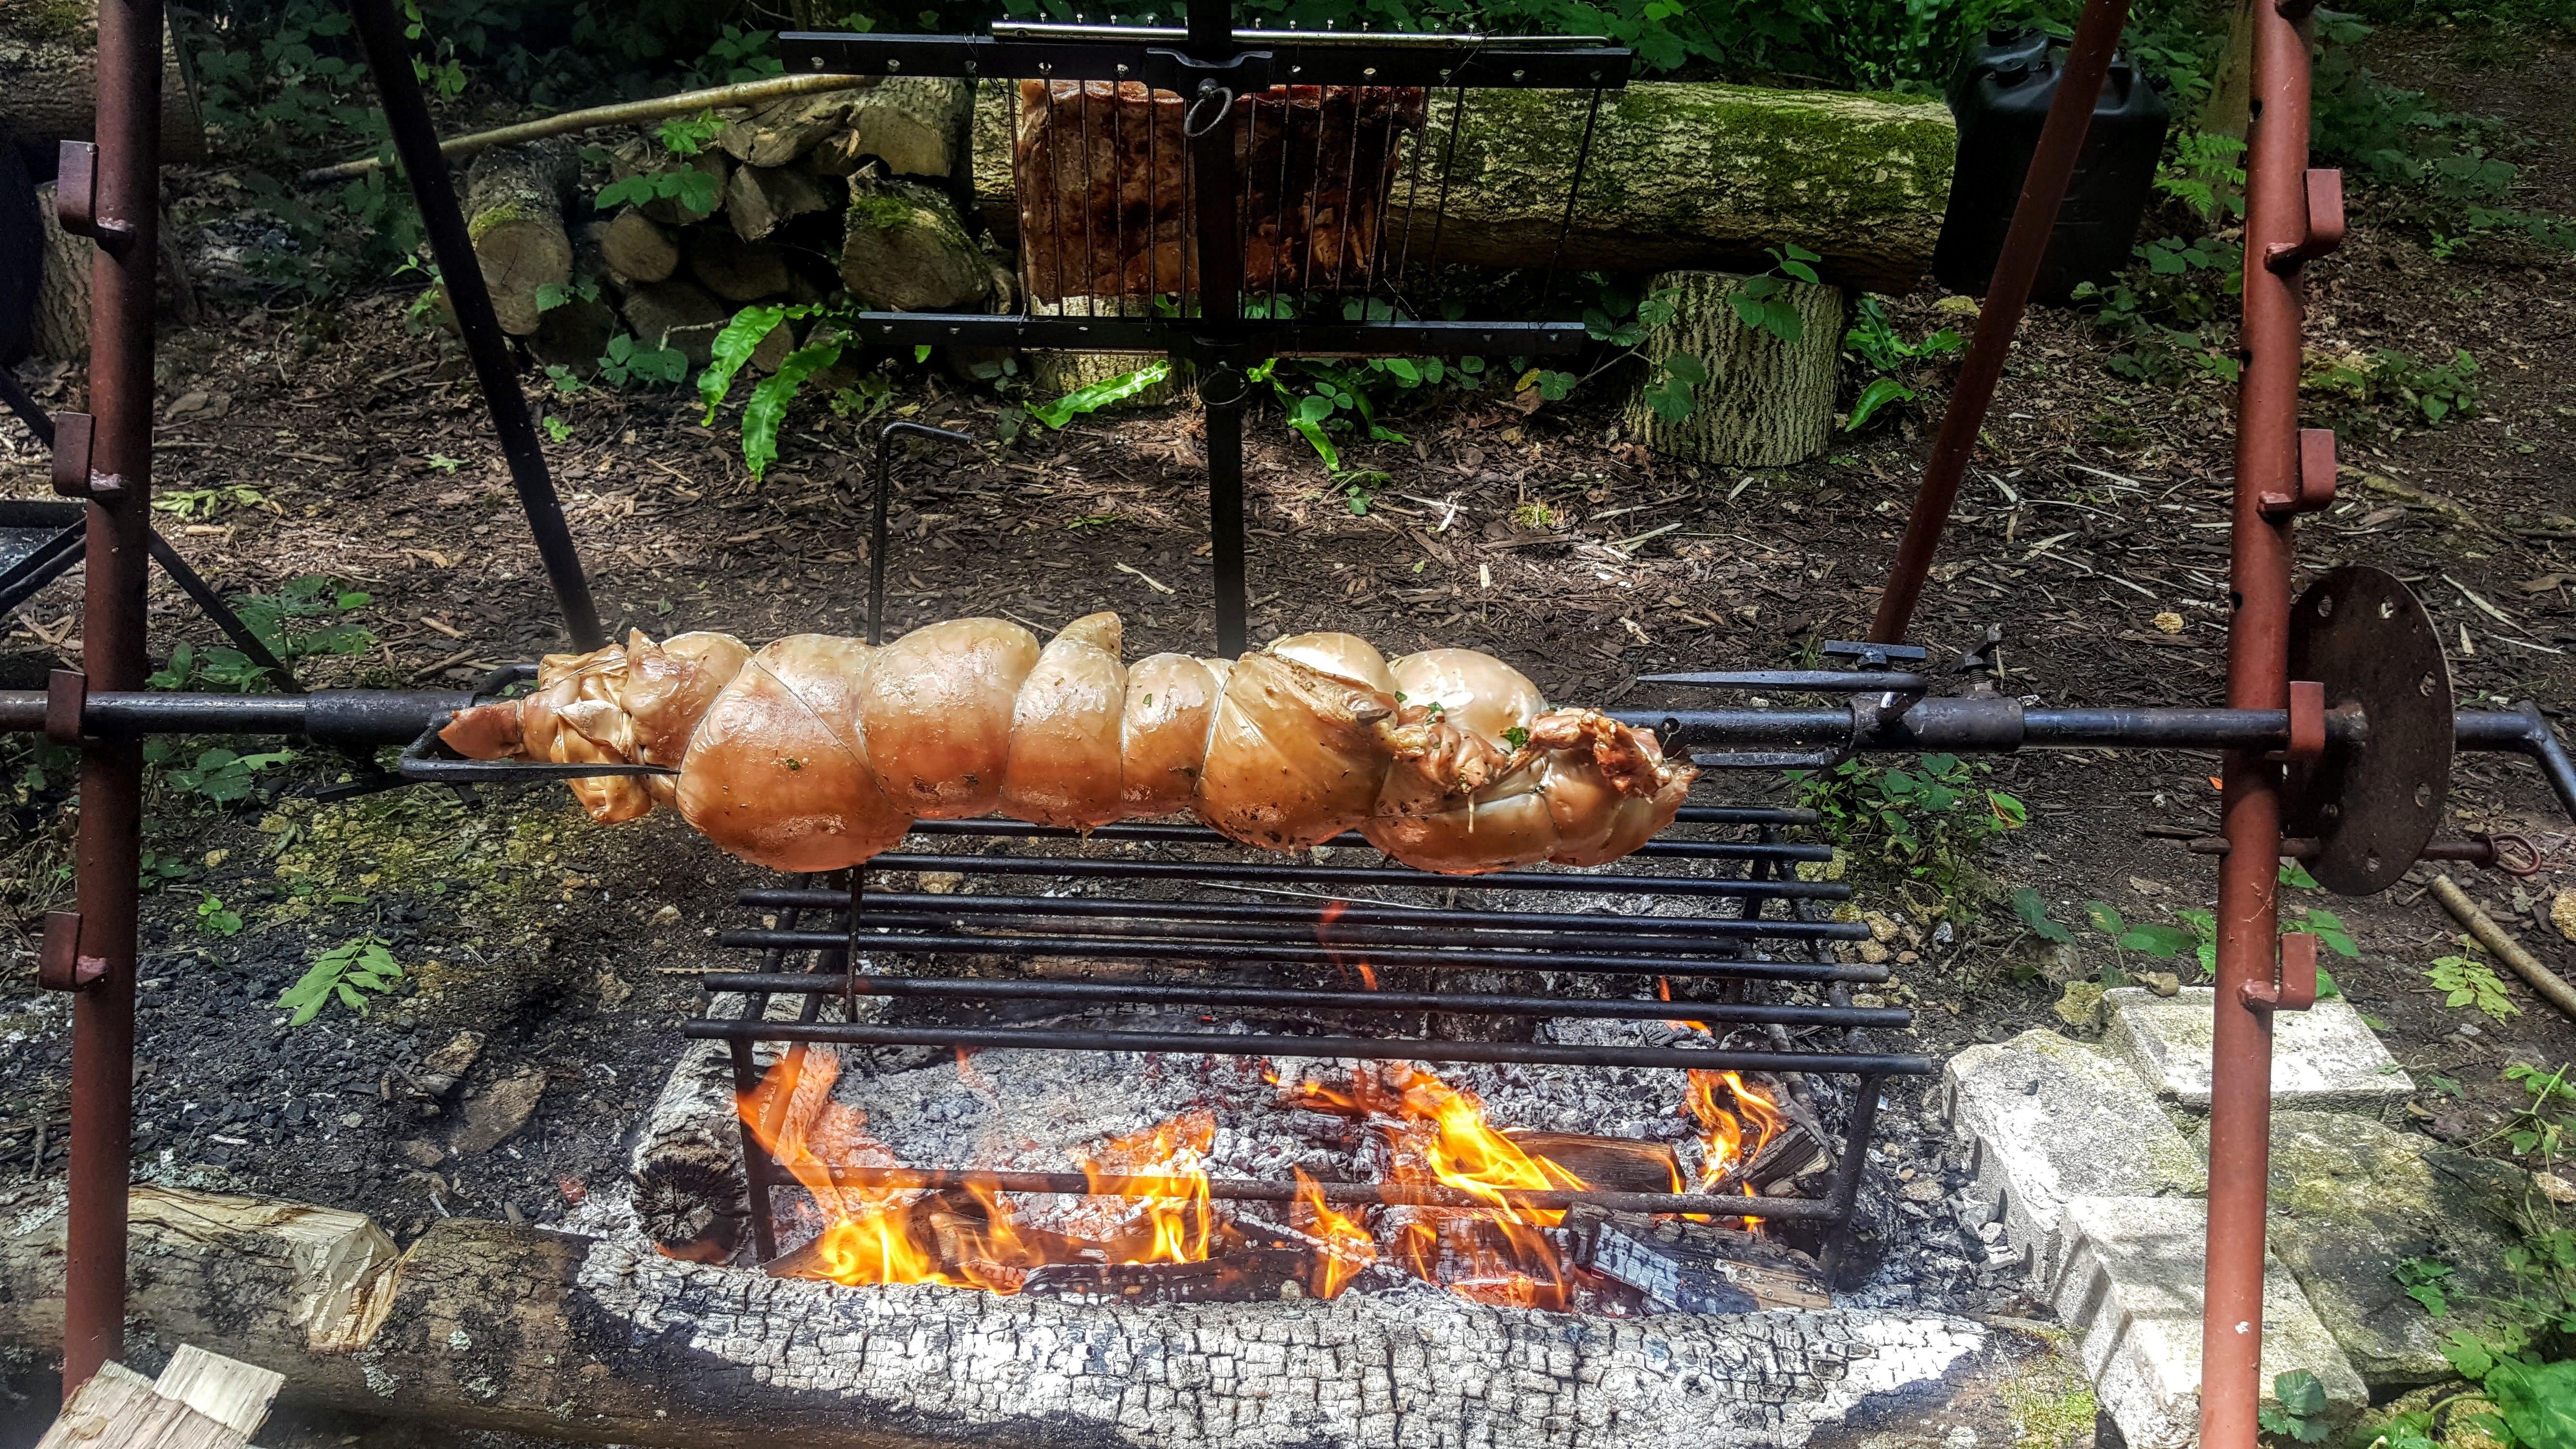 Slow roast suckling pig - porchetta style herb stuffed